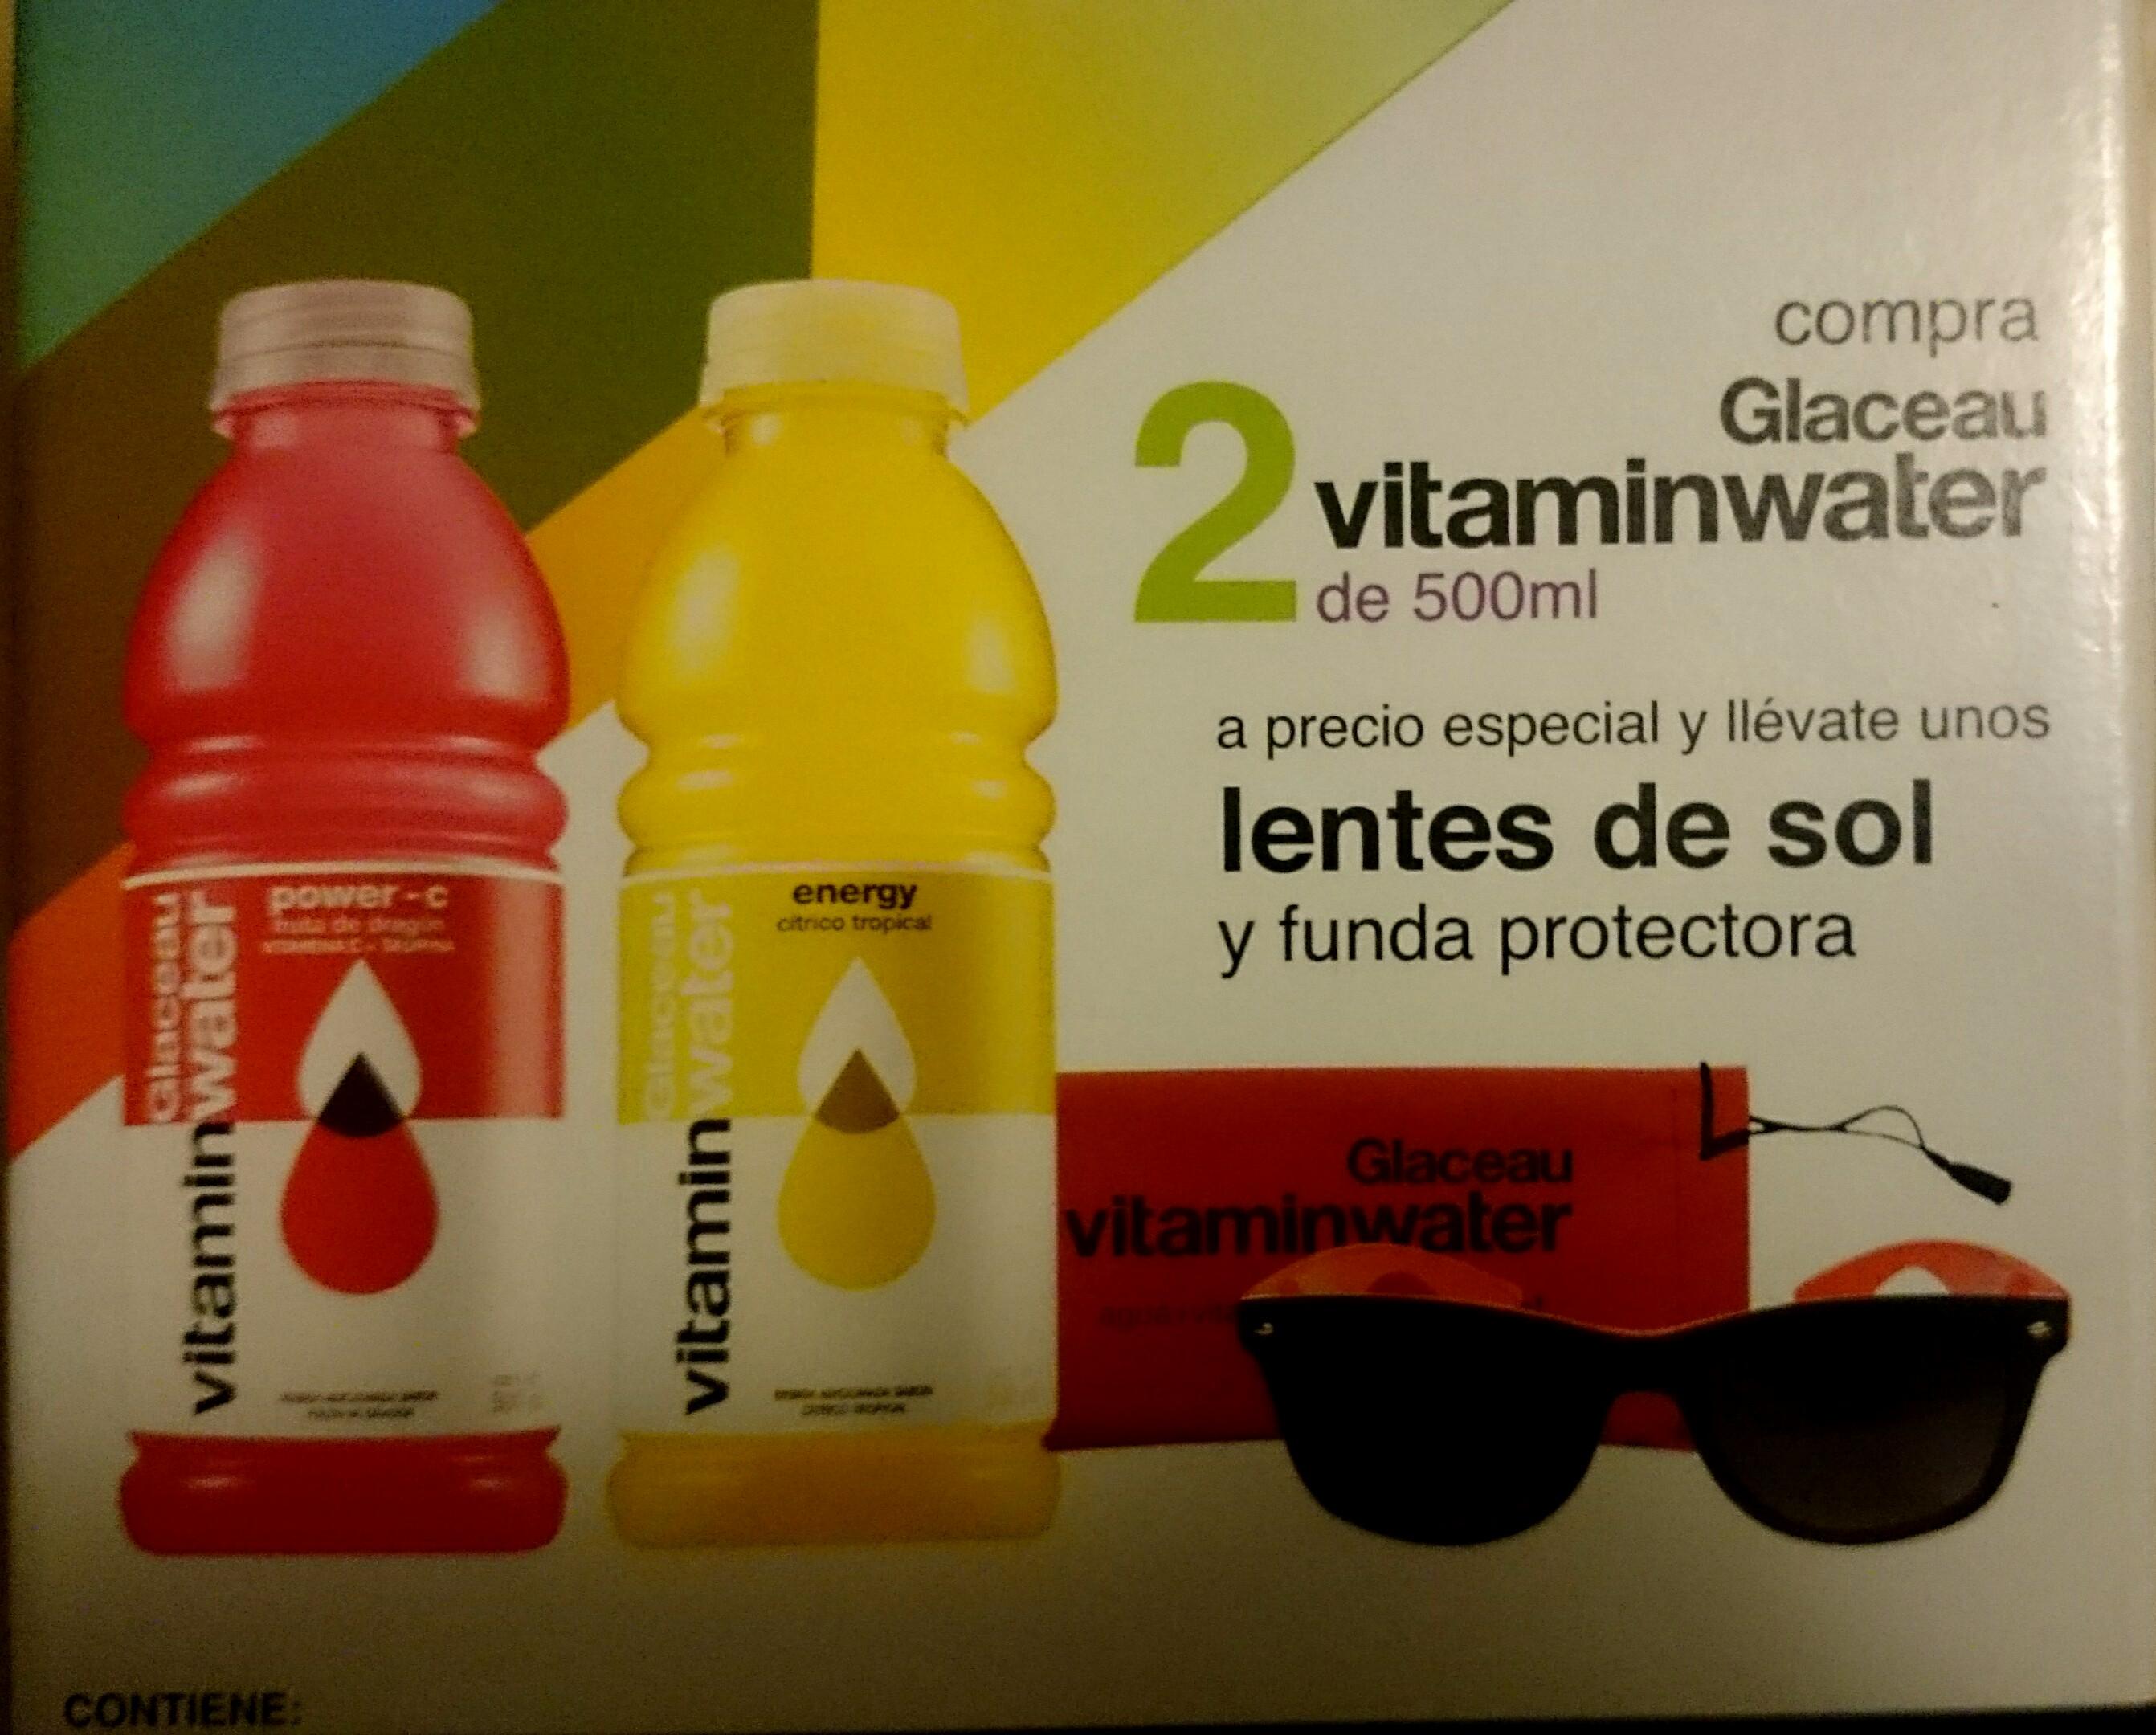 Walmart: 2 botellas Glaceu Vitamin Water + Lentes por $32.02